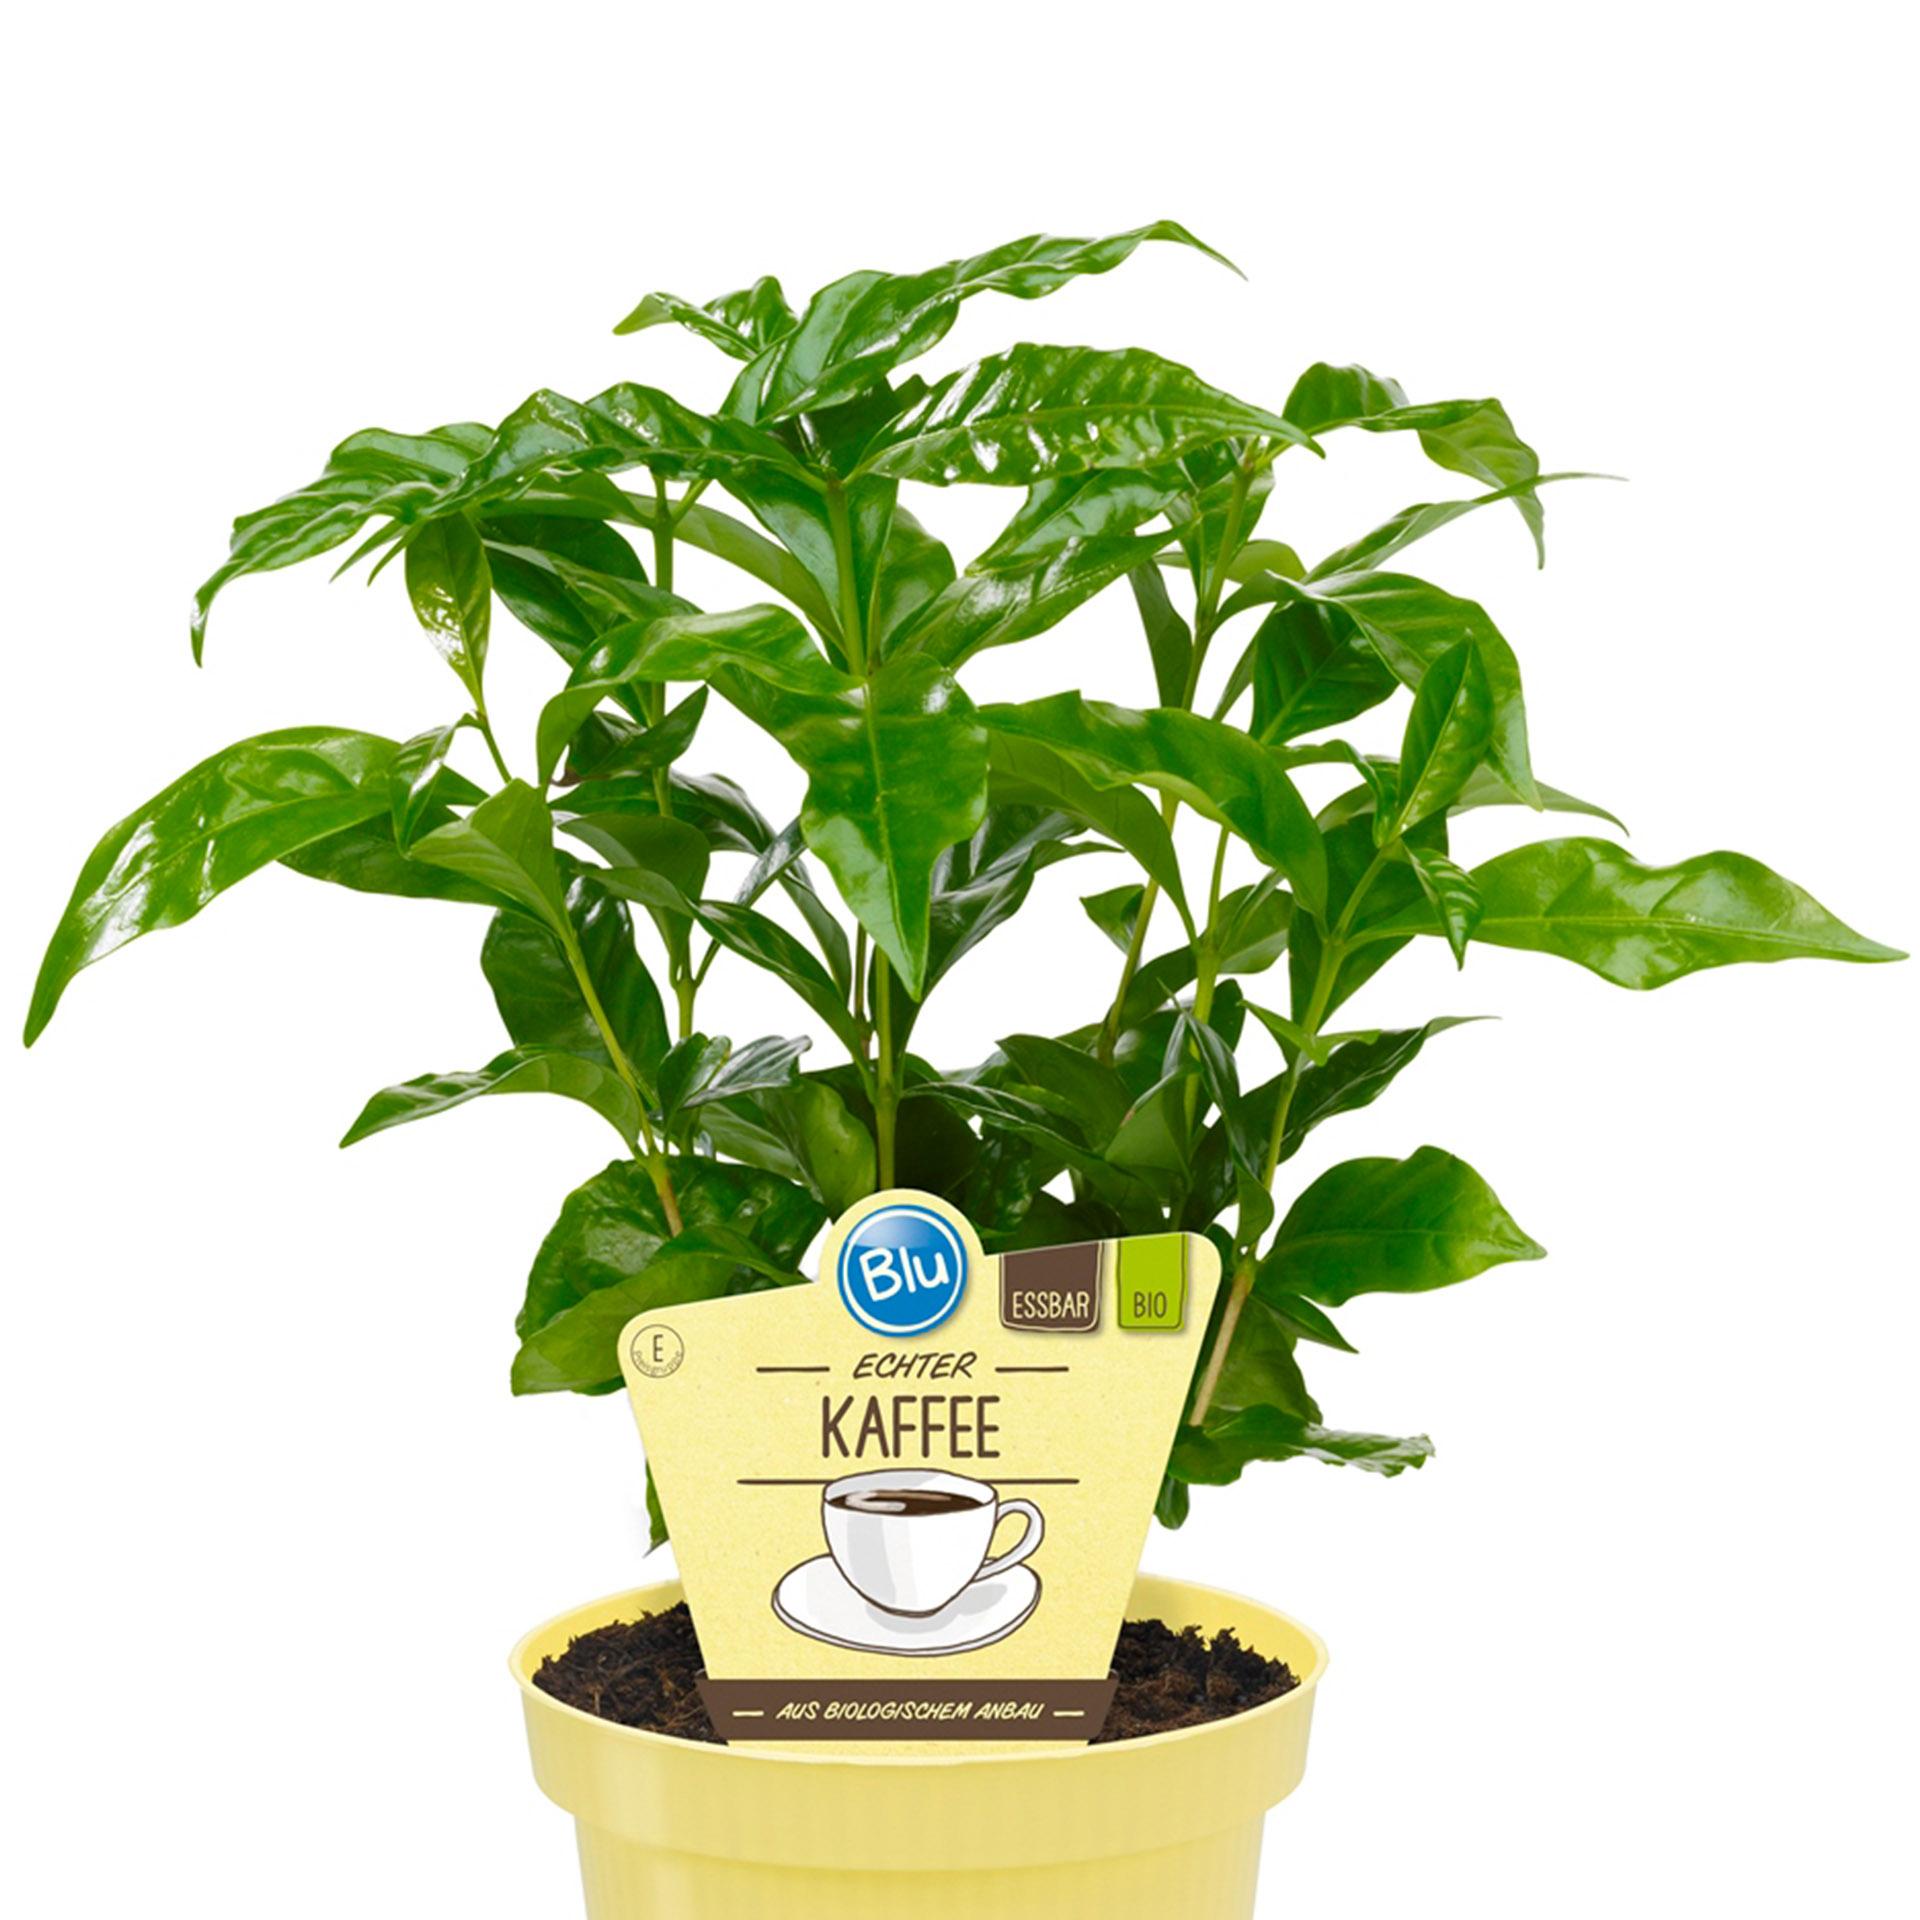 Echter Kaffee-Coffea arabica PG-E